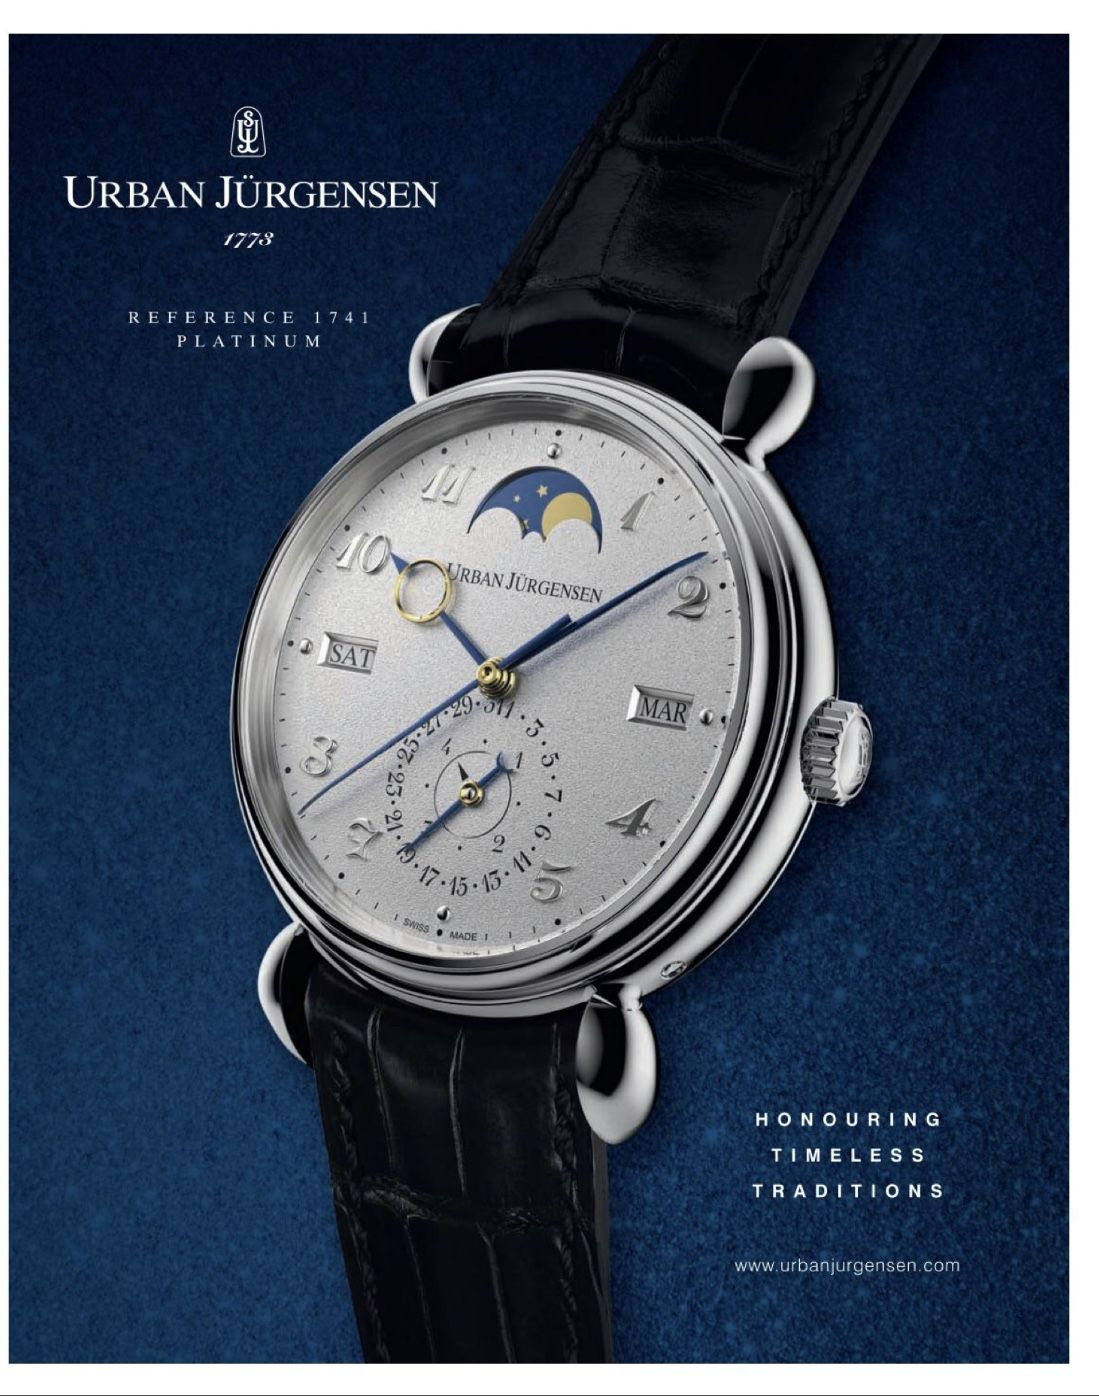 52f0abaab66 Pin de Levi Castro em Relógios Urban Jürgensen em 2019